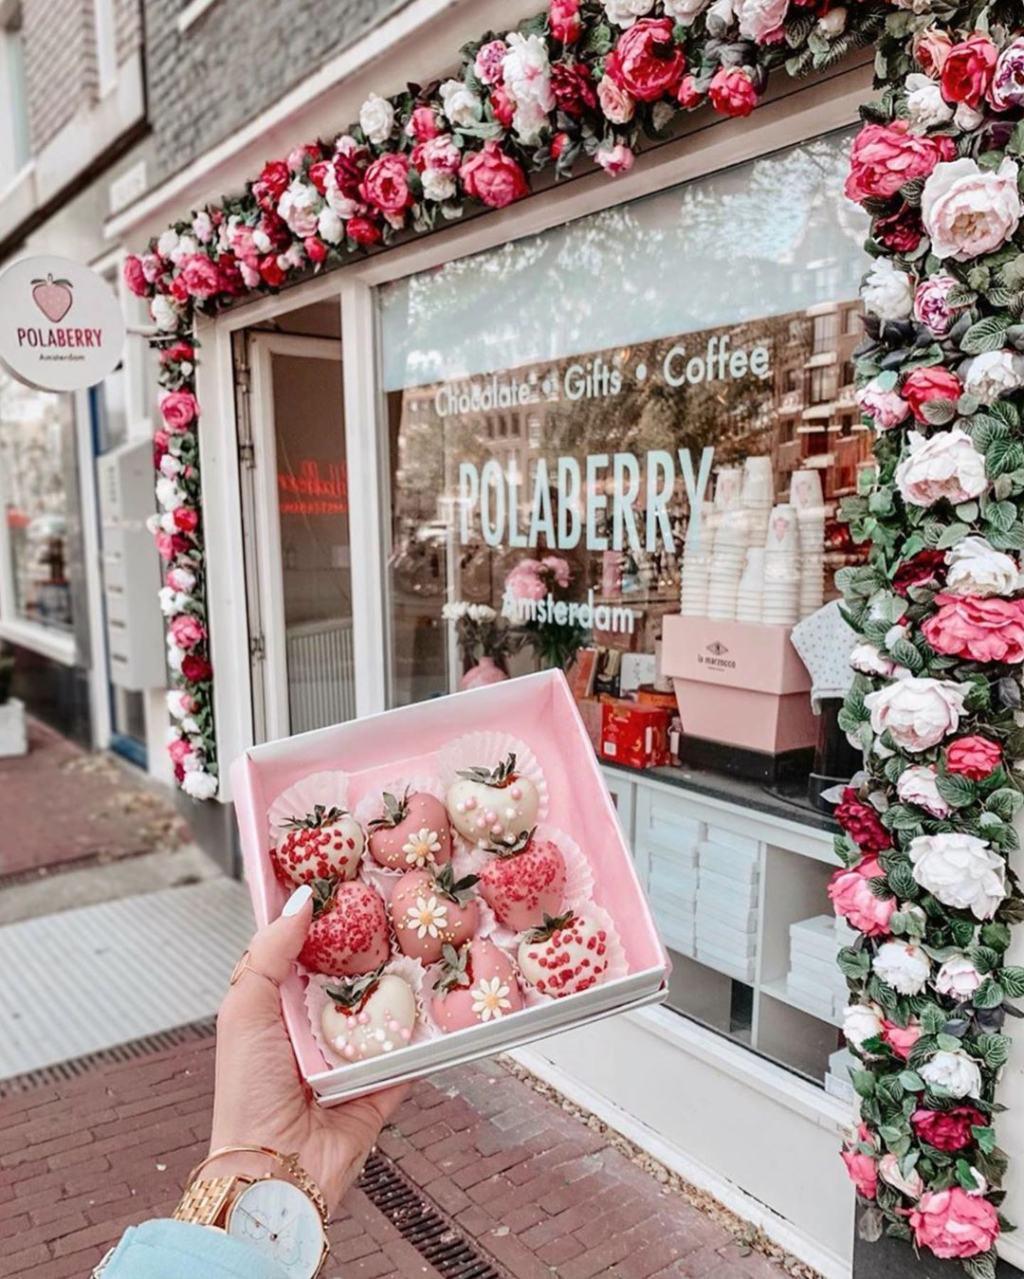 Polaberry, Amsterdam by @lenasaibel